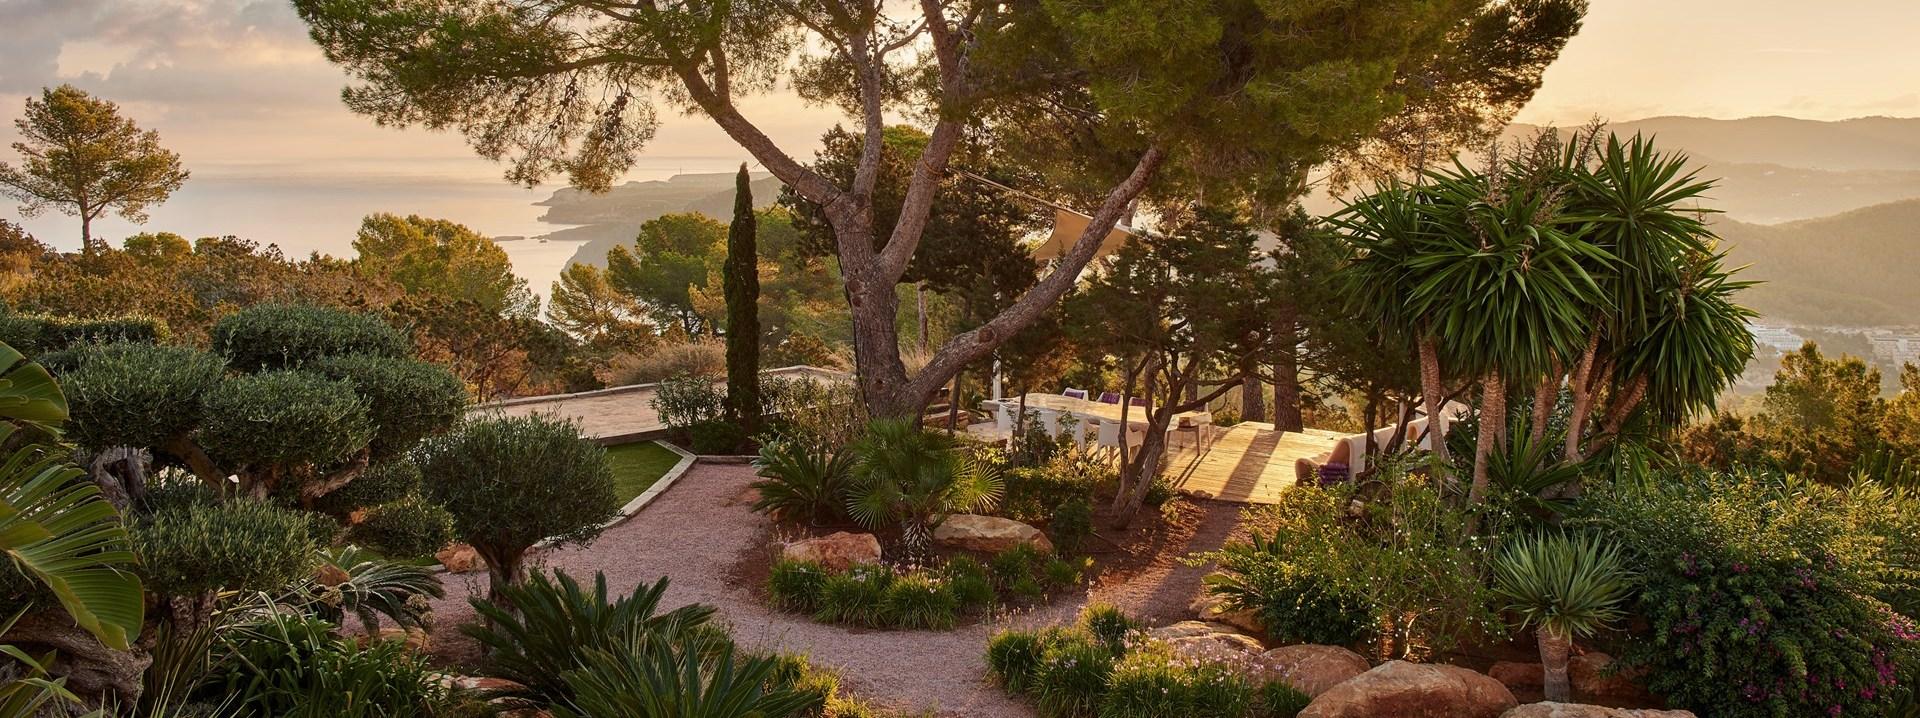 al-fresco-dining-sea-view-ibiza